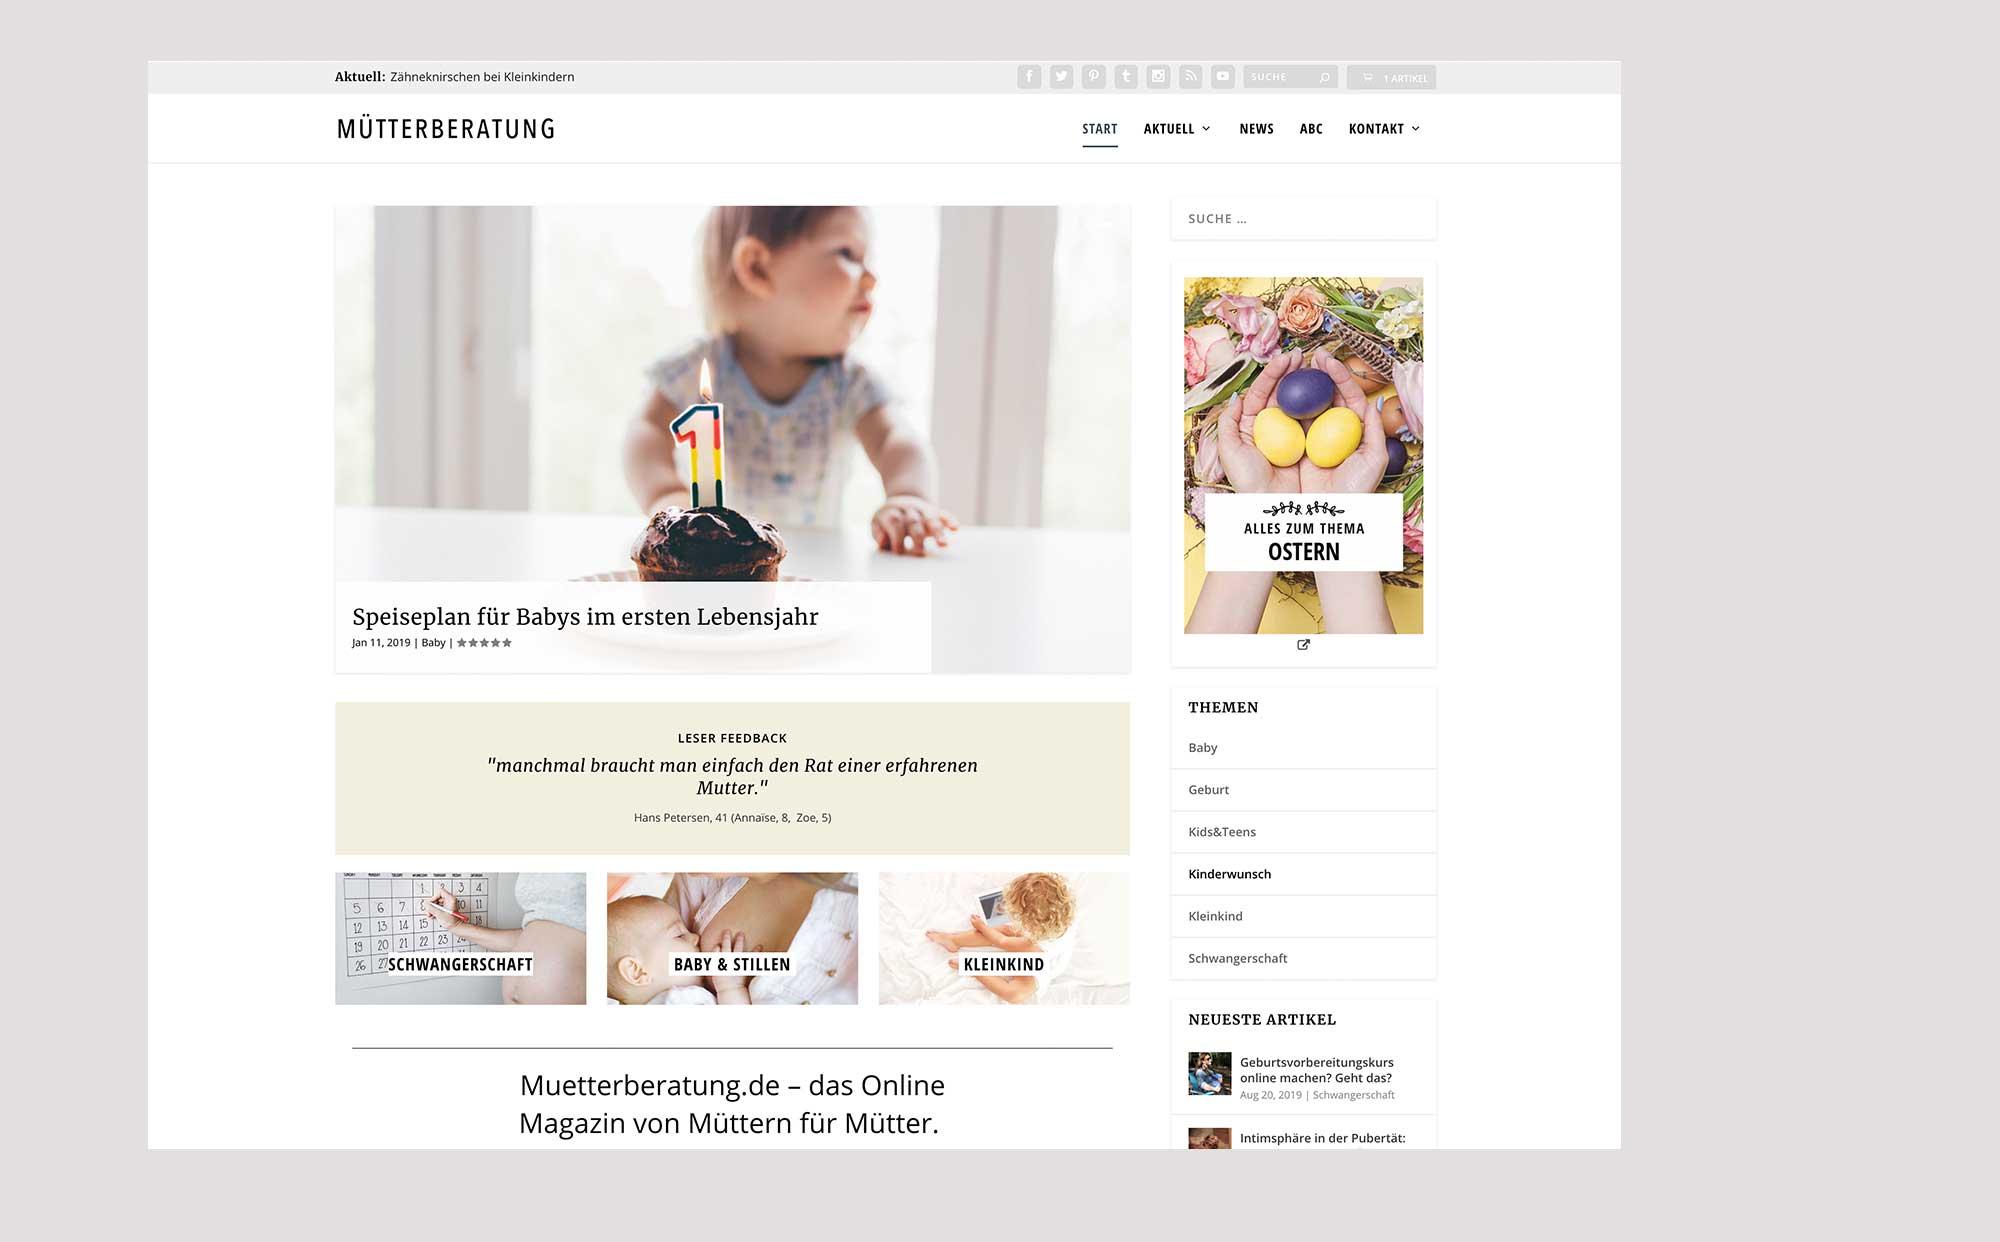 zwei-klicks: muetterberatung.de